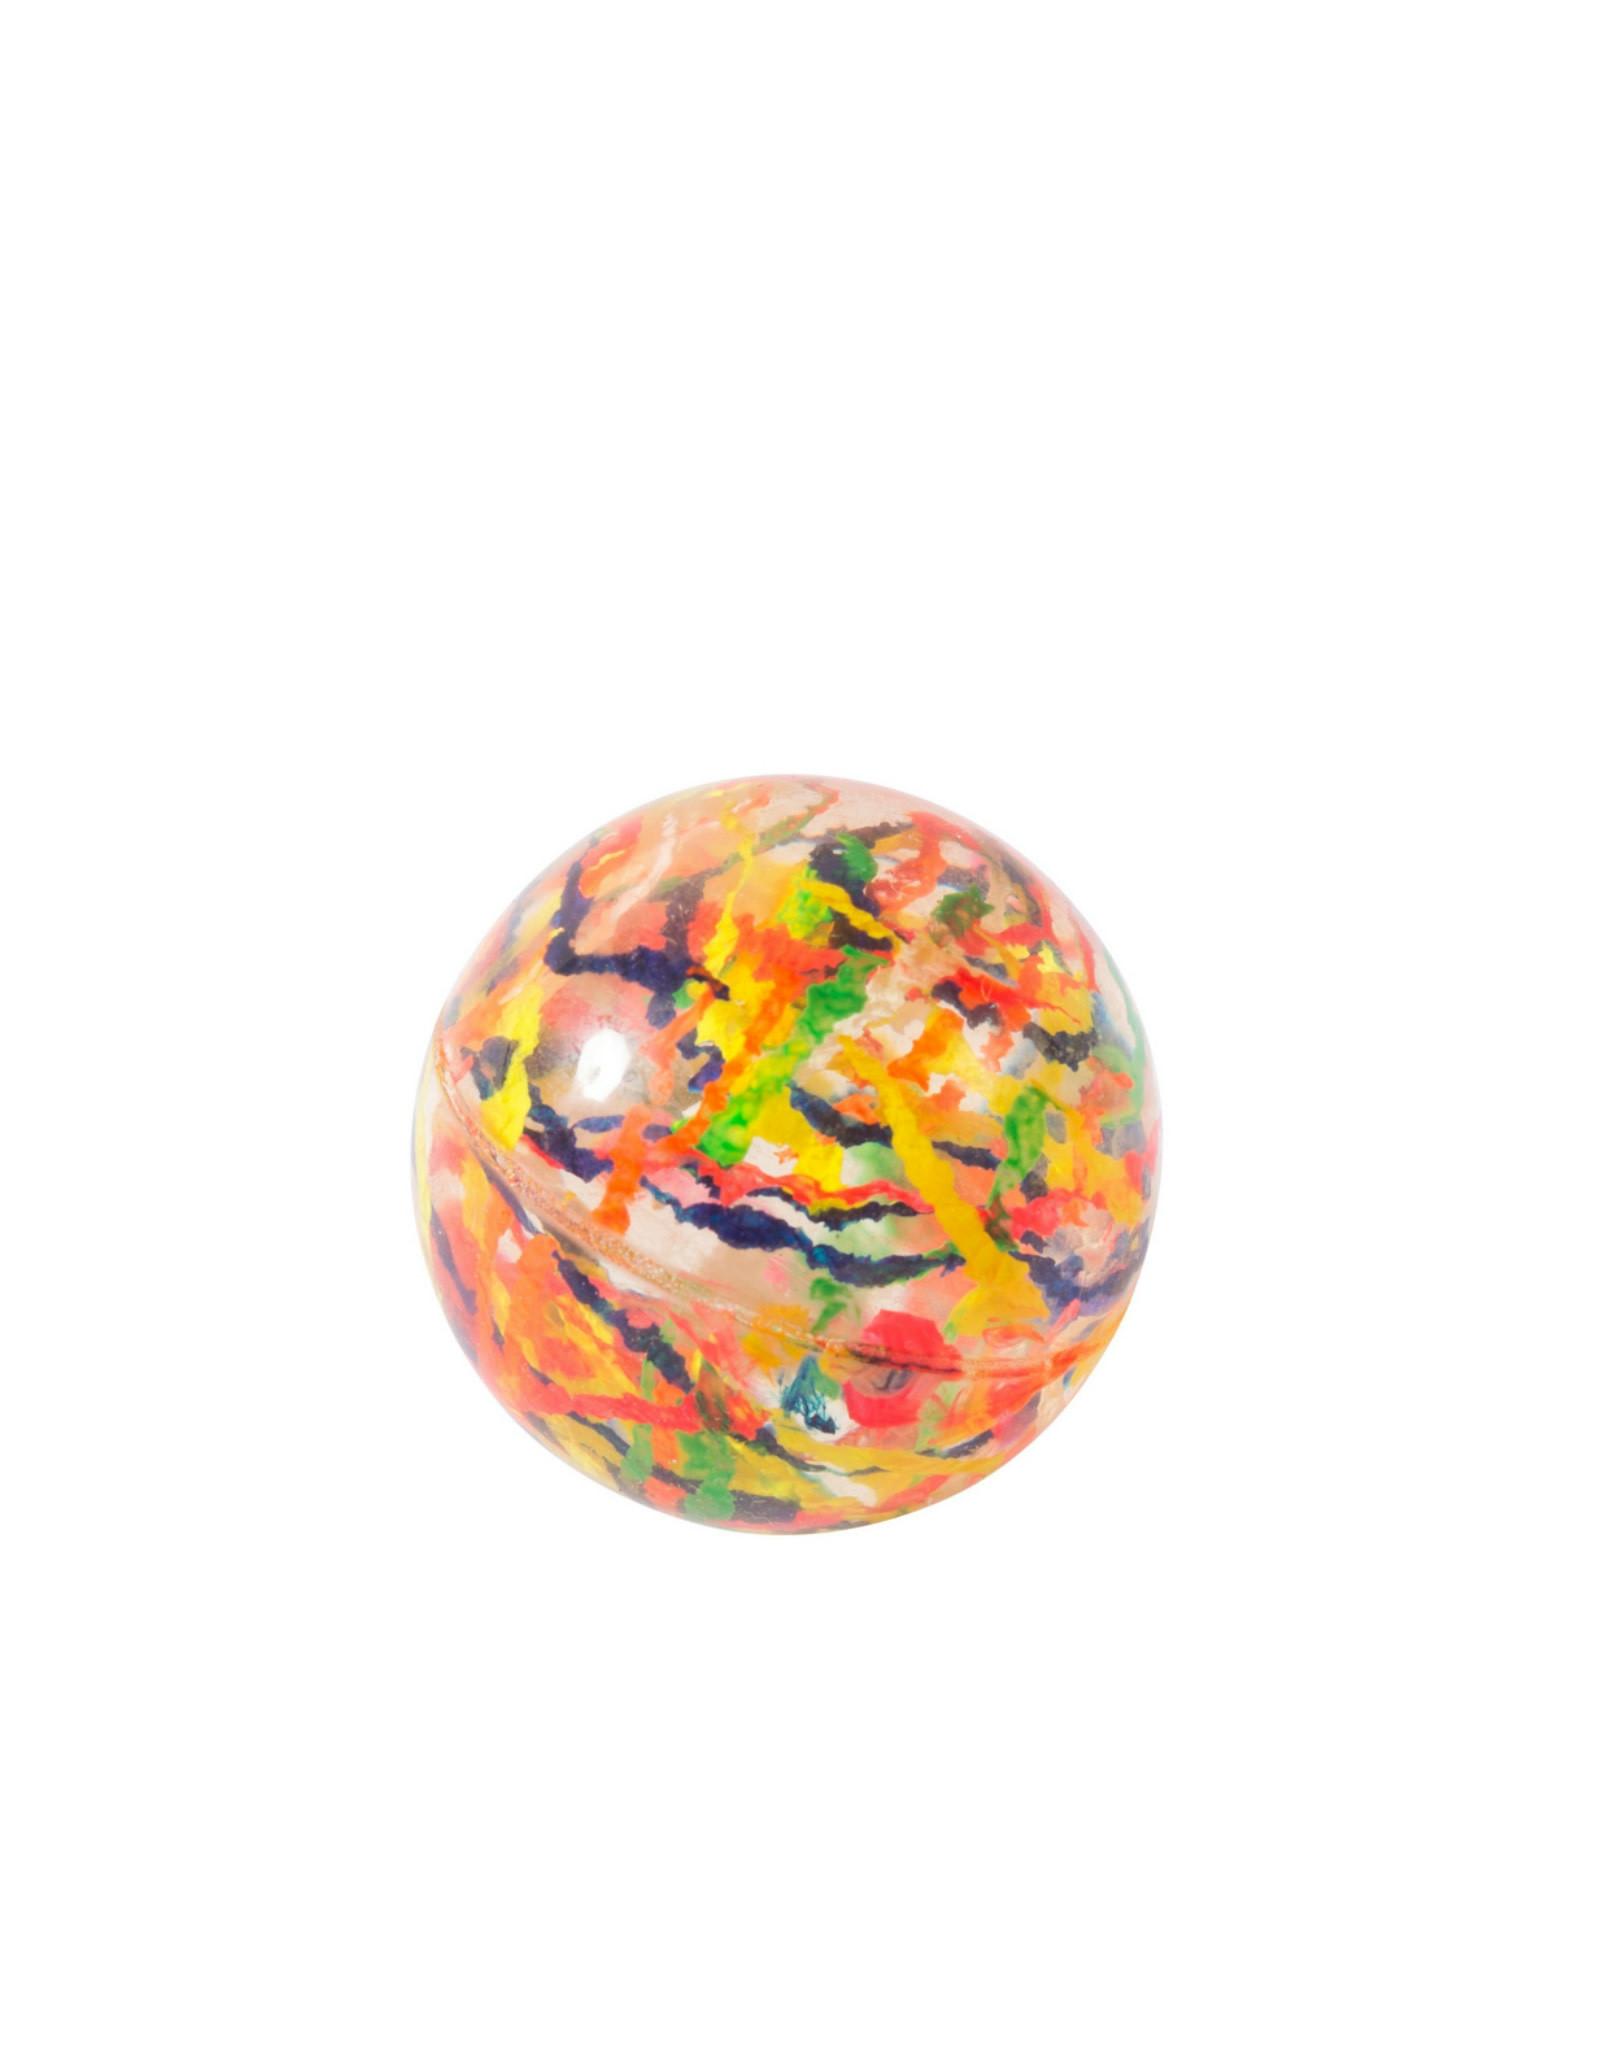 Moulin Roty Bouncy Ball - Orange Blue Green